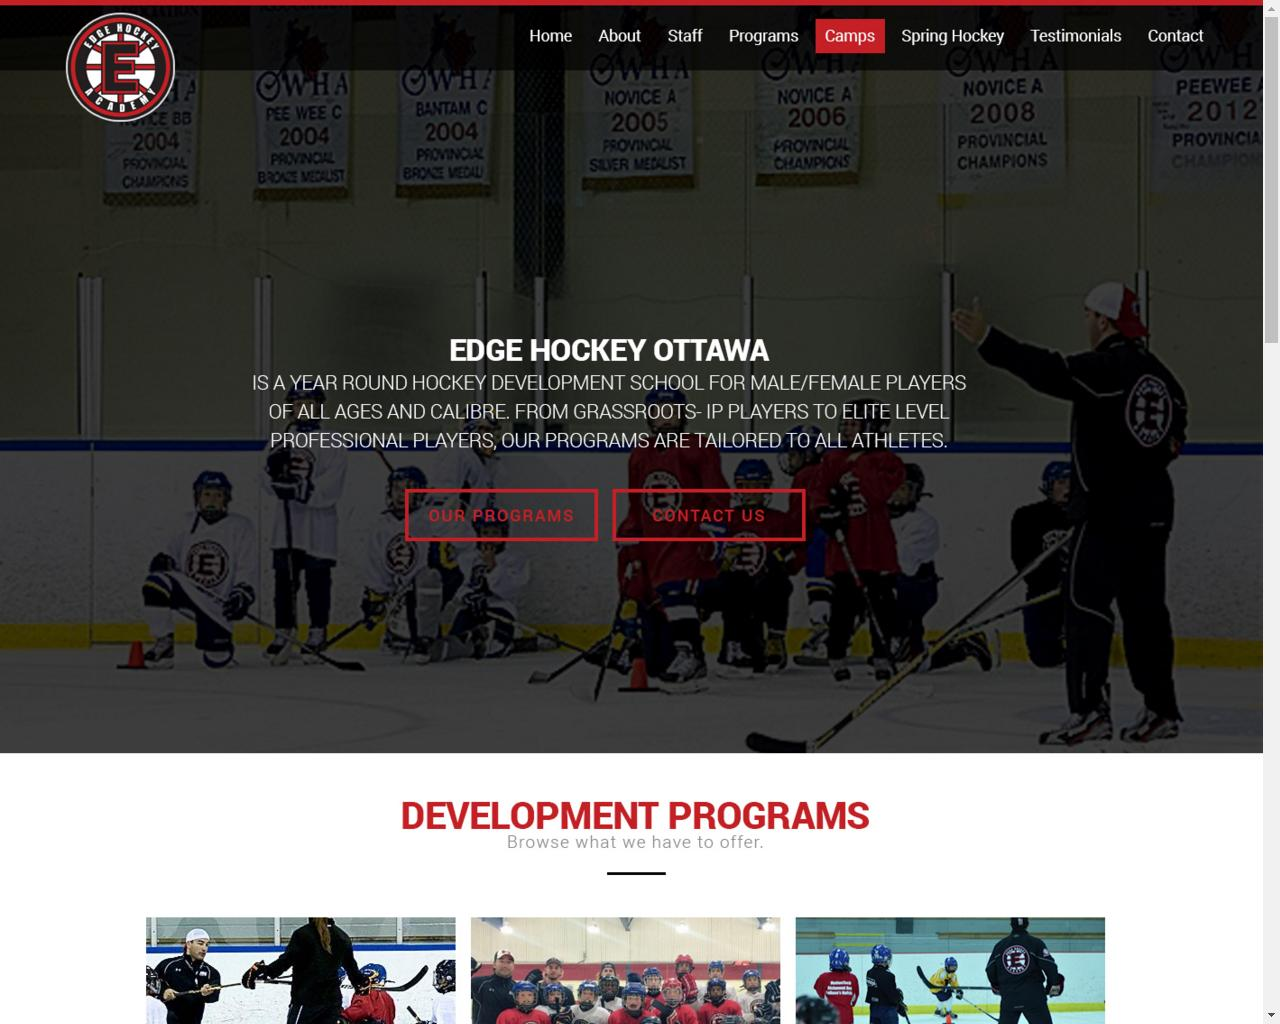 Edge Hockey Ottawa